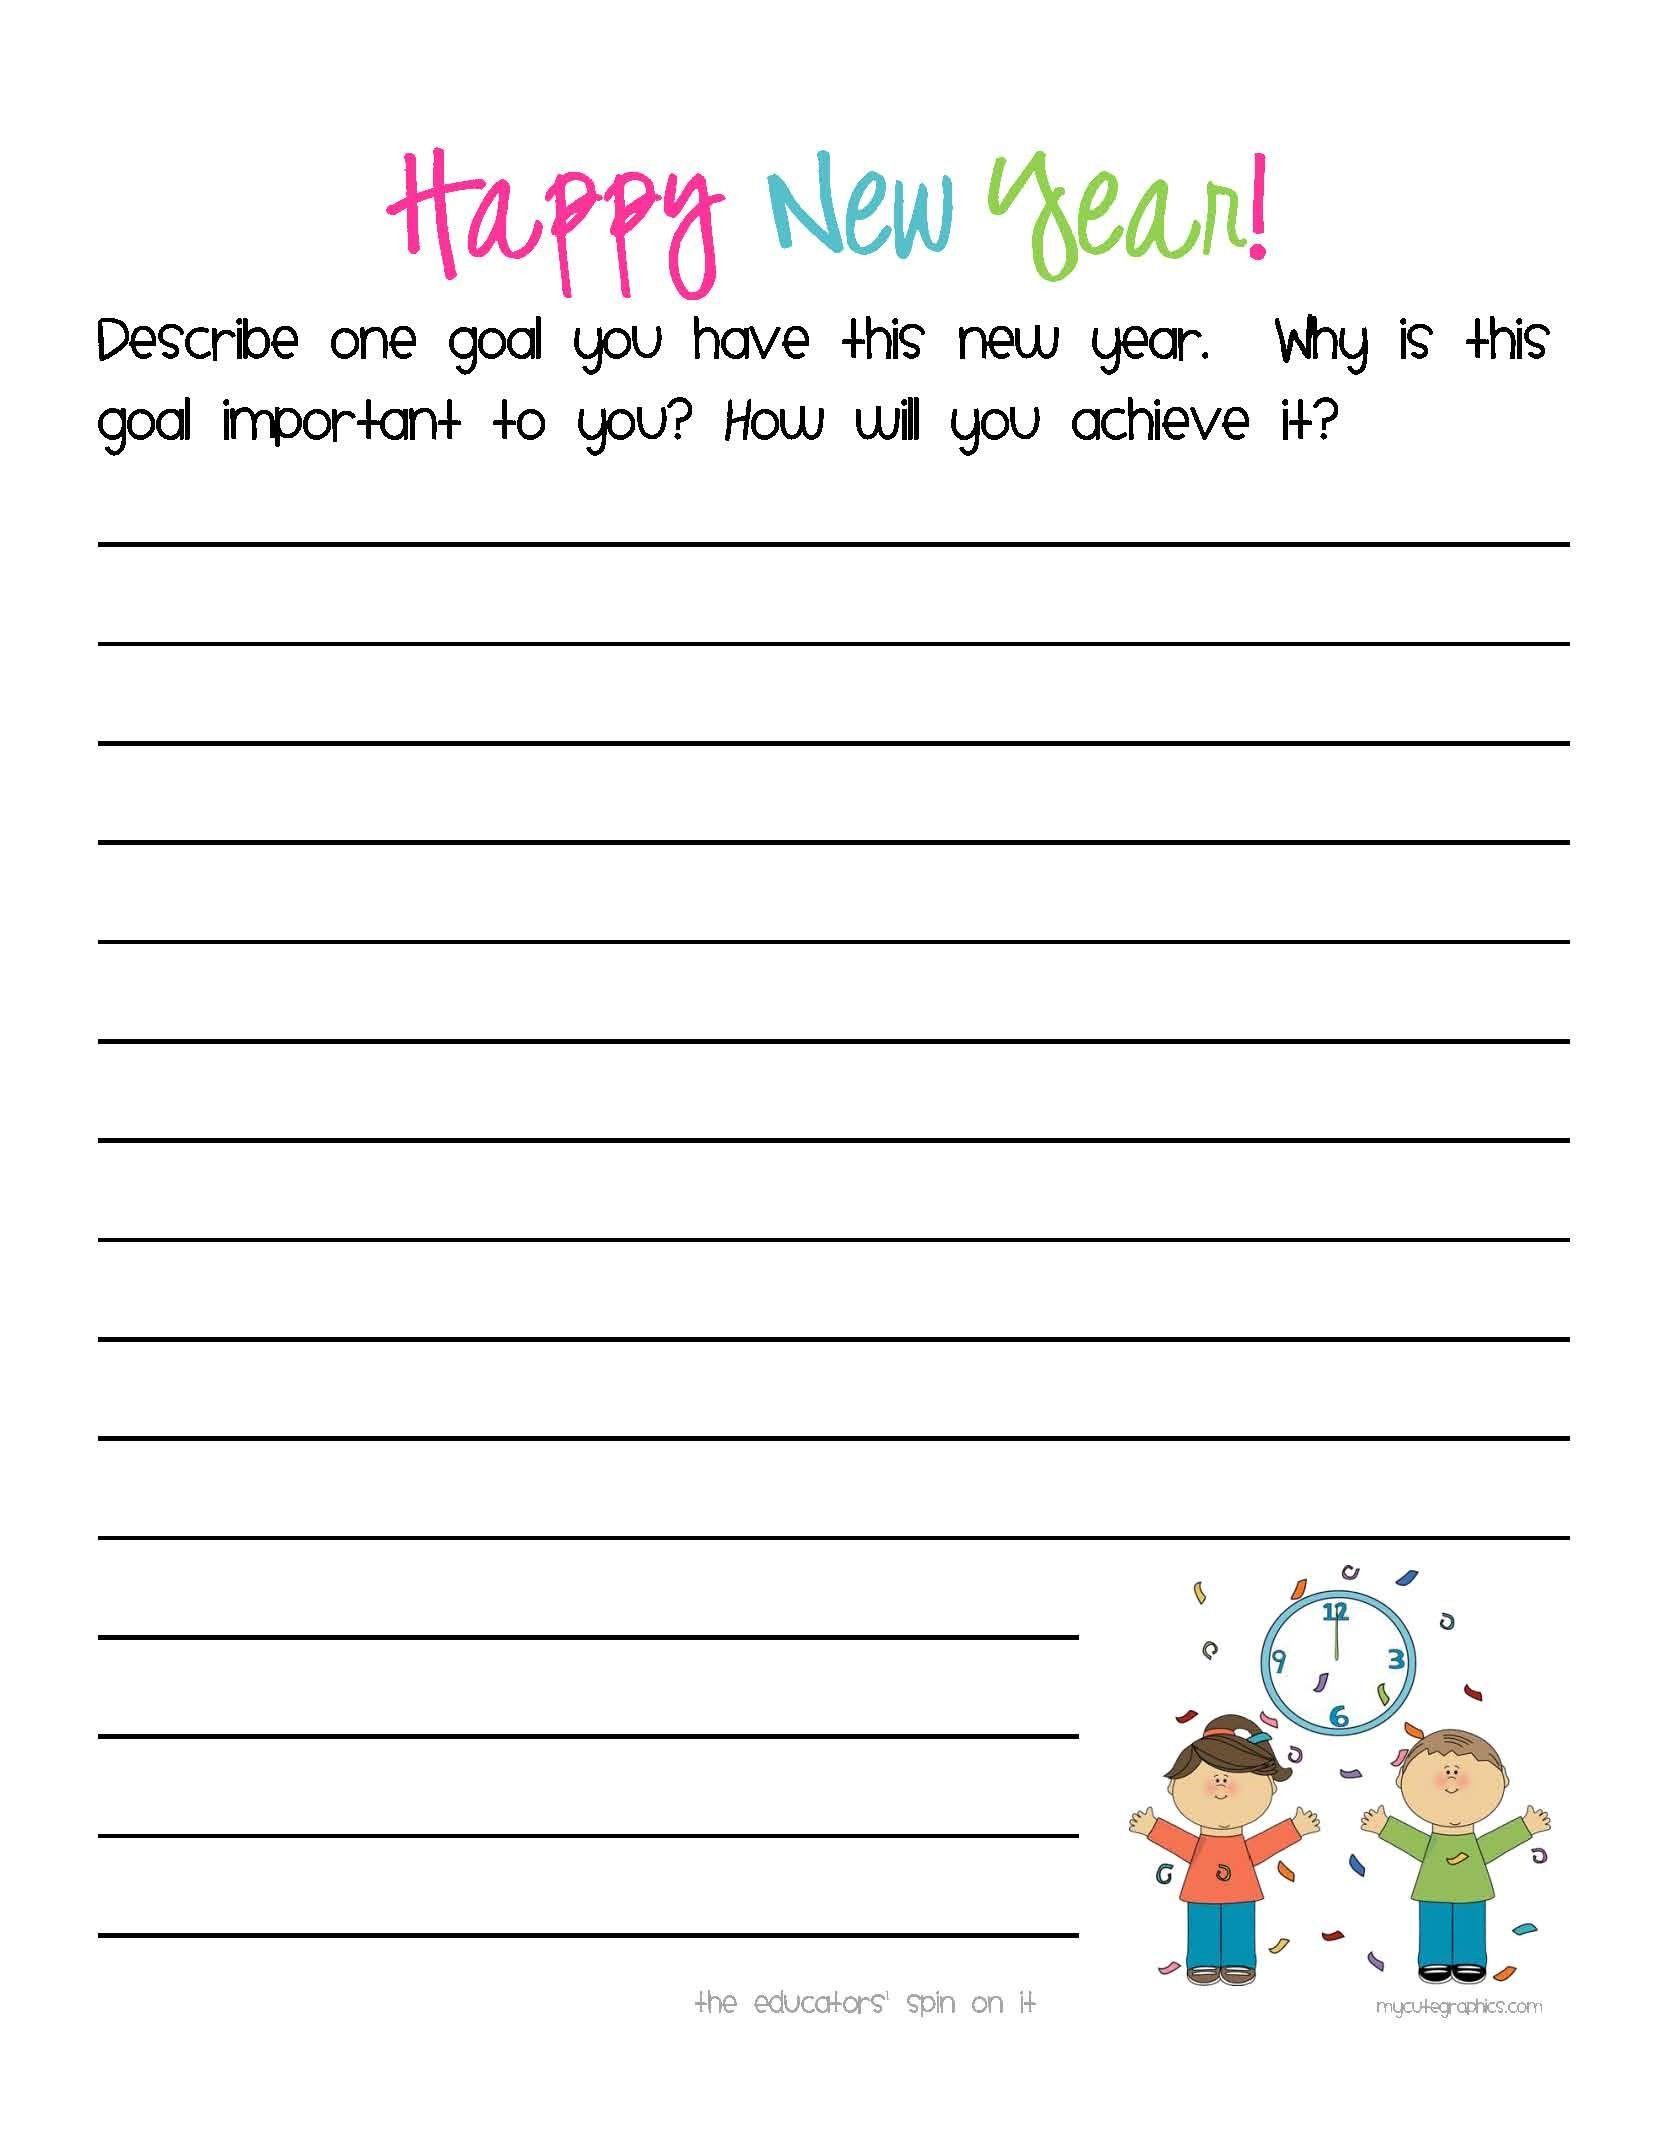 hight resolution of 4th Grade Essay Writing Worksheets 6 4th Grade Essay Writing Worksheets  Worksheets   Creative writing worksheets